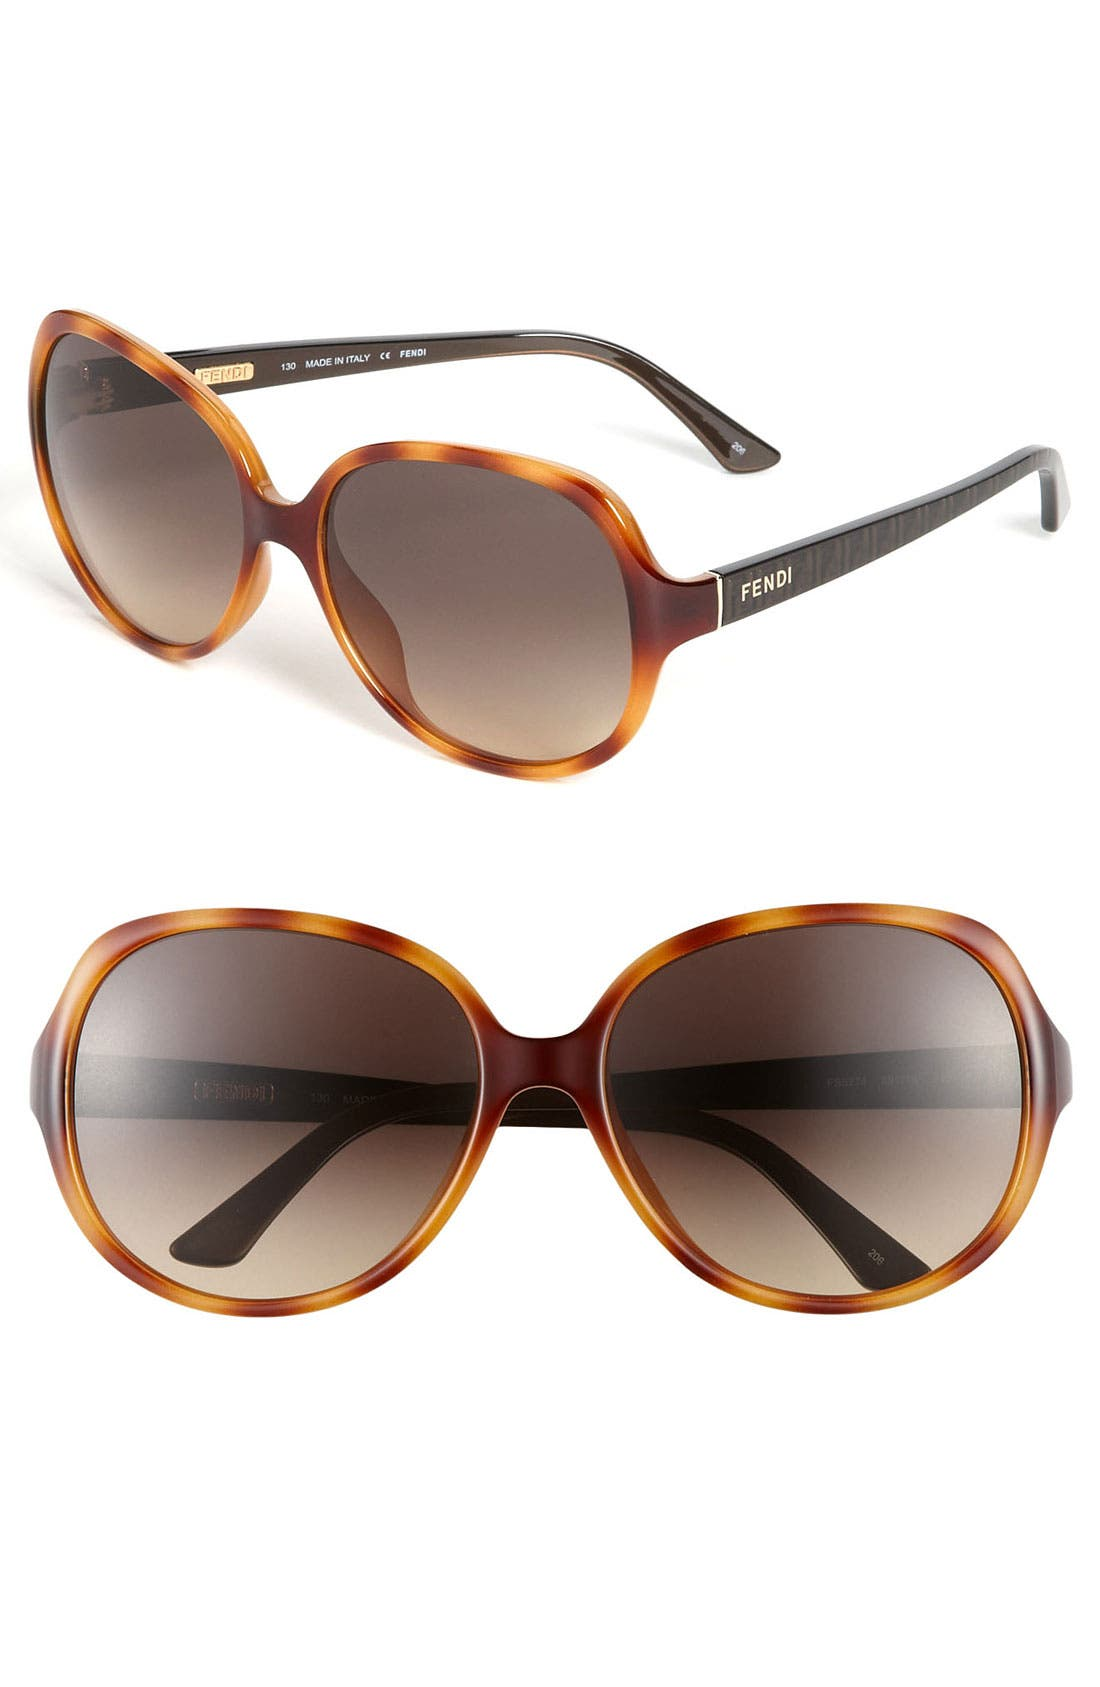 Alternate Image 1 Selected - Fendi 59mm Sunglasses